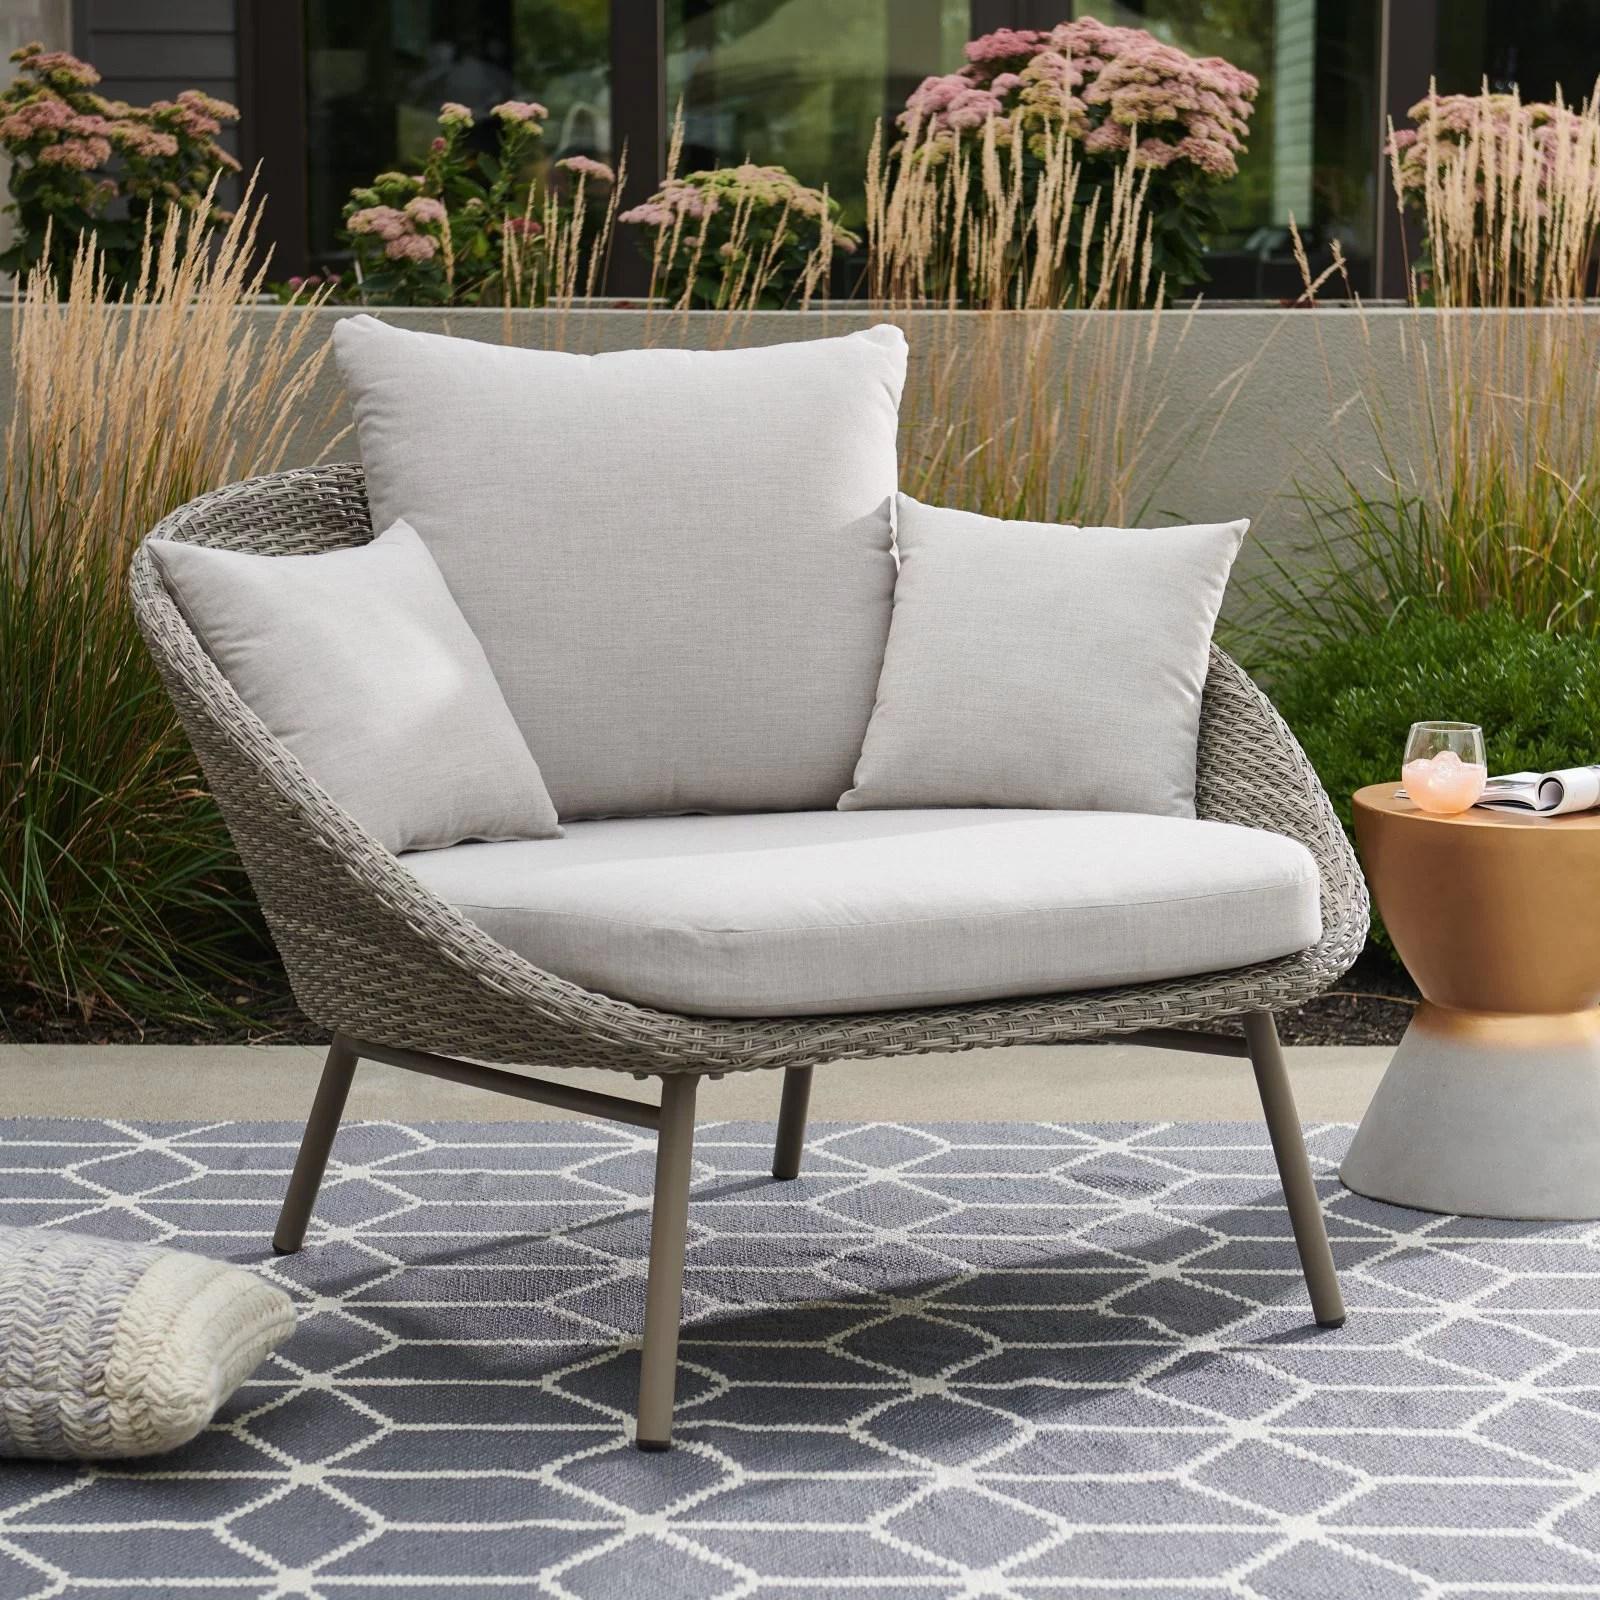 walmart patio furniture sale shop the